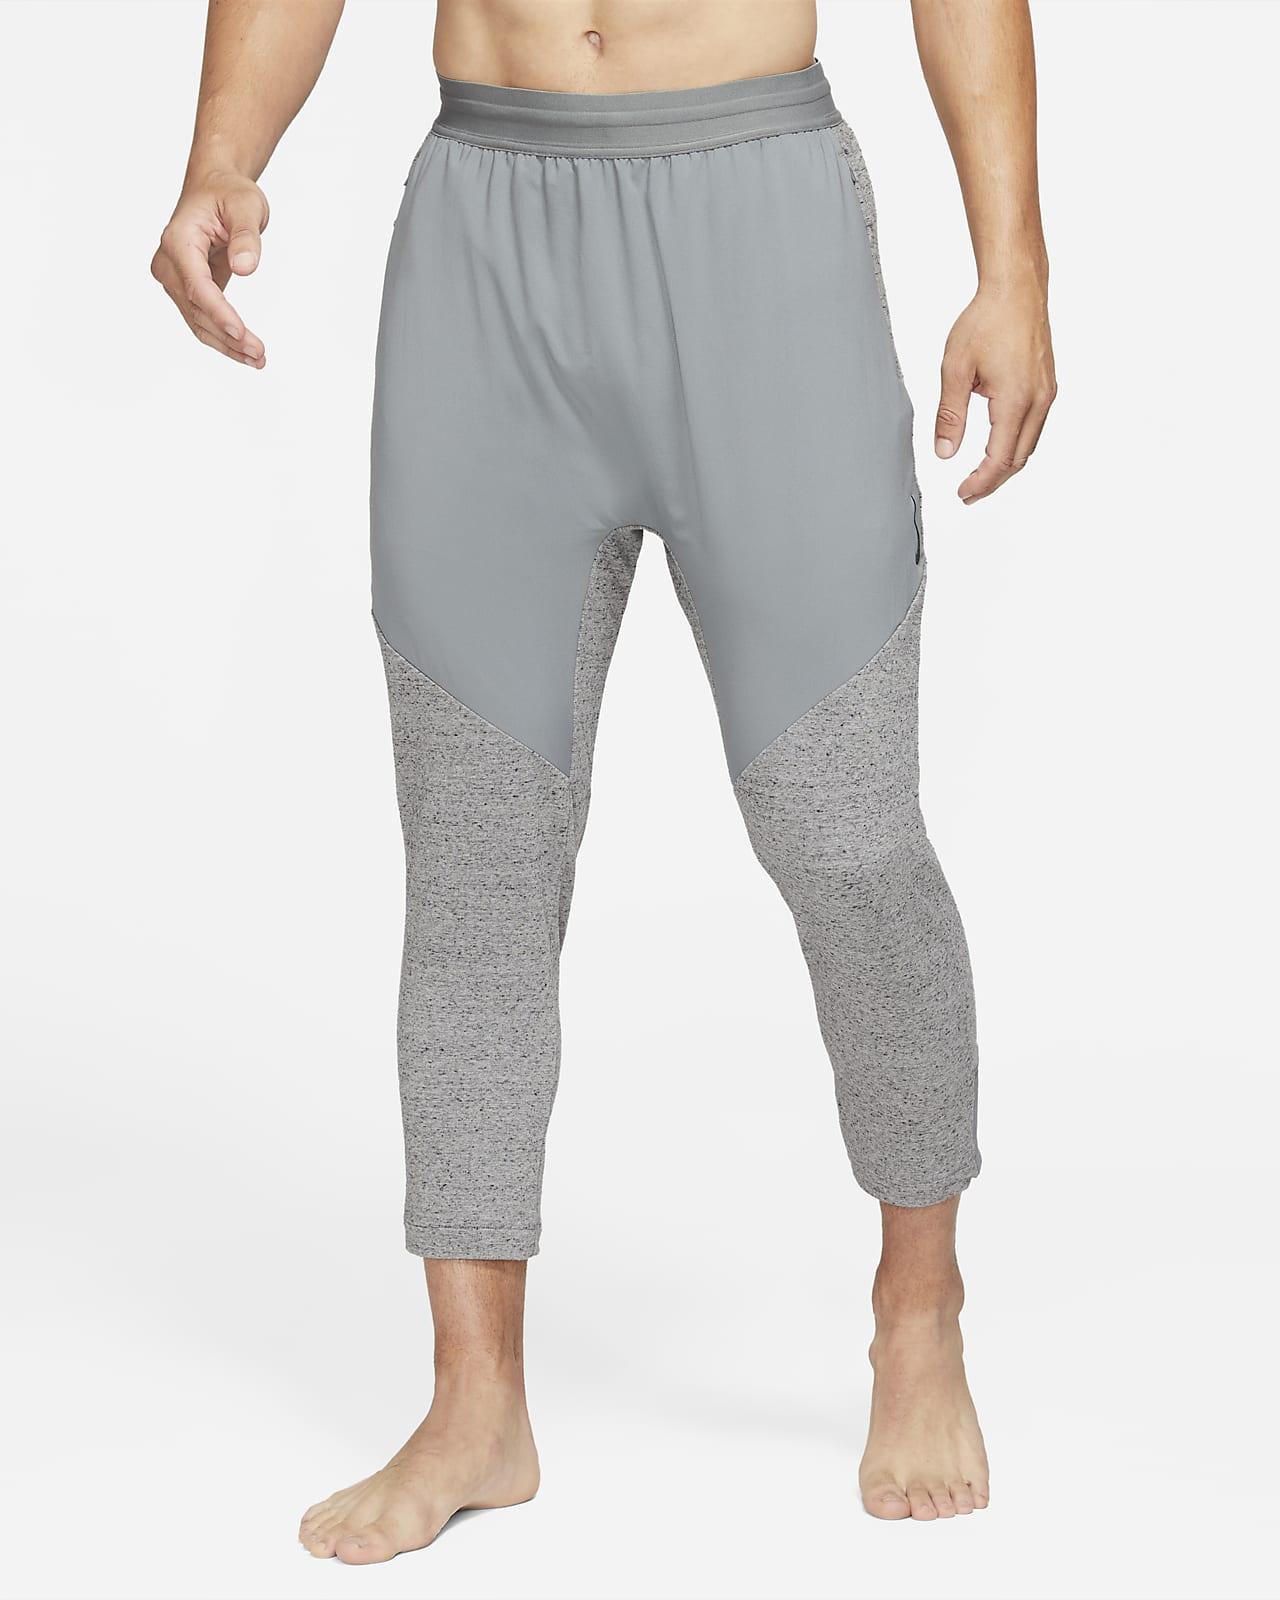 Pánské kalhoty Nike Yoga Dri-FIT